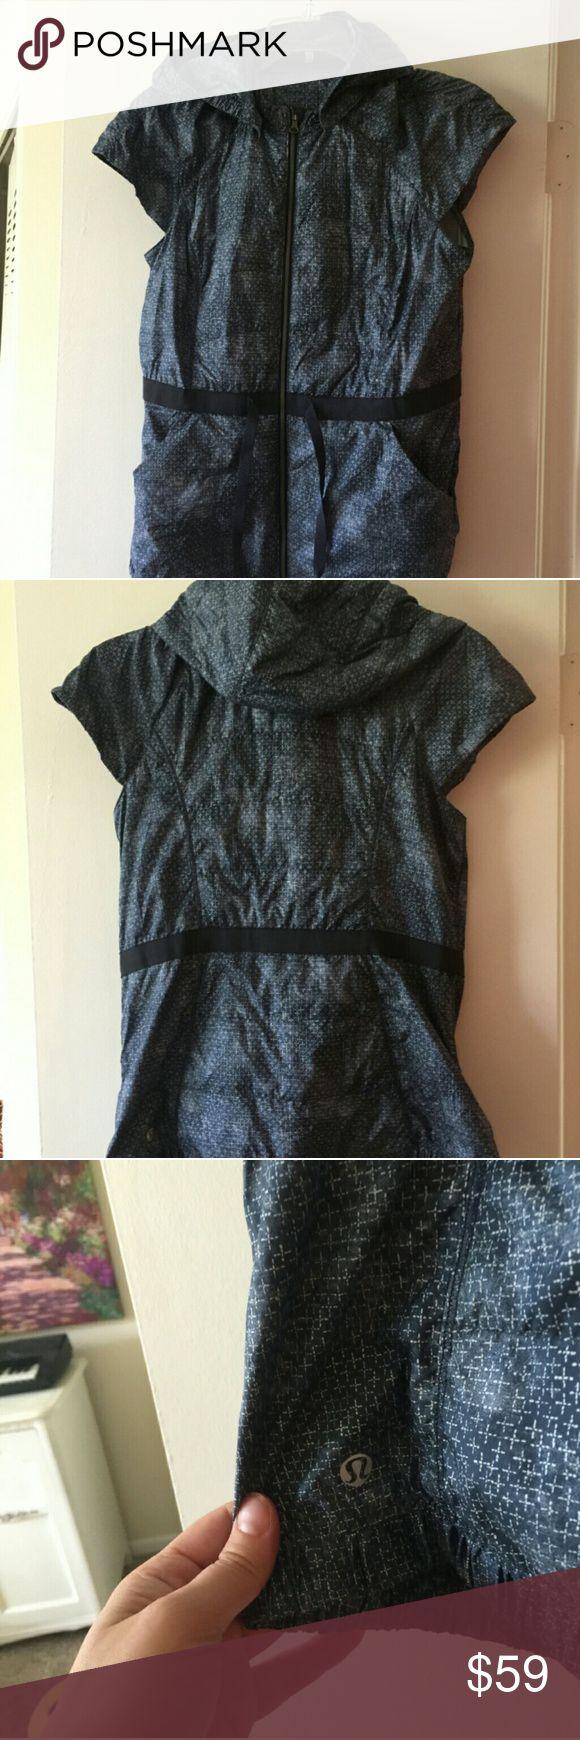 Lululemon vest Like new lululemon athletica Jackets & Coats Vests